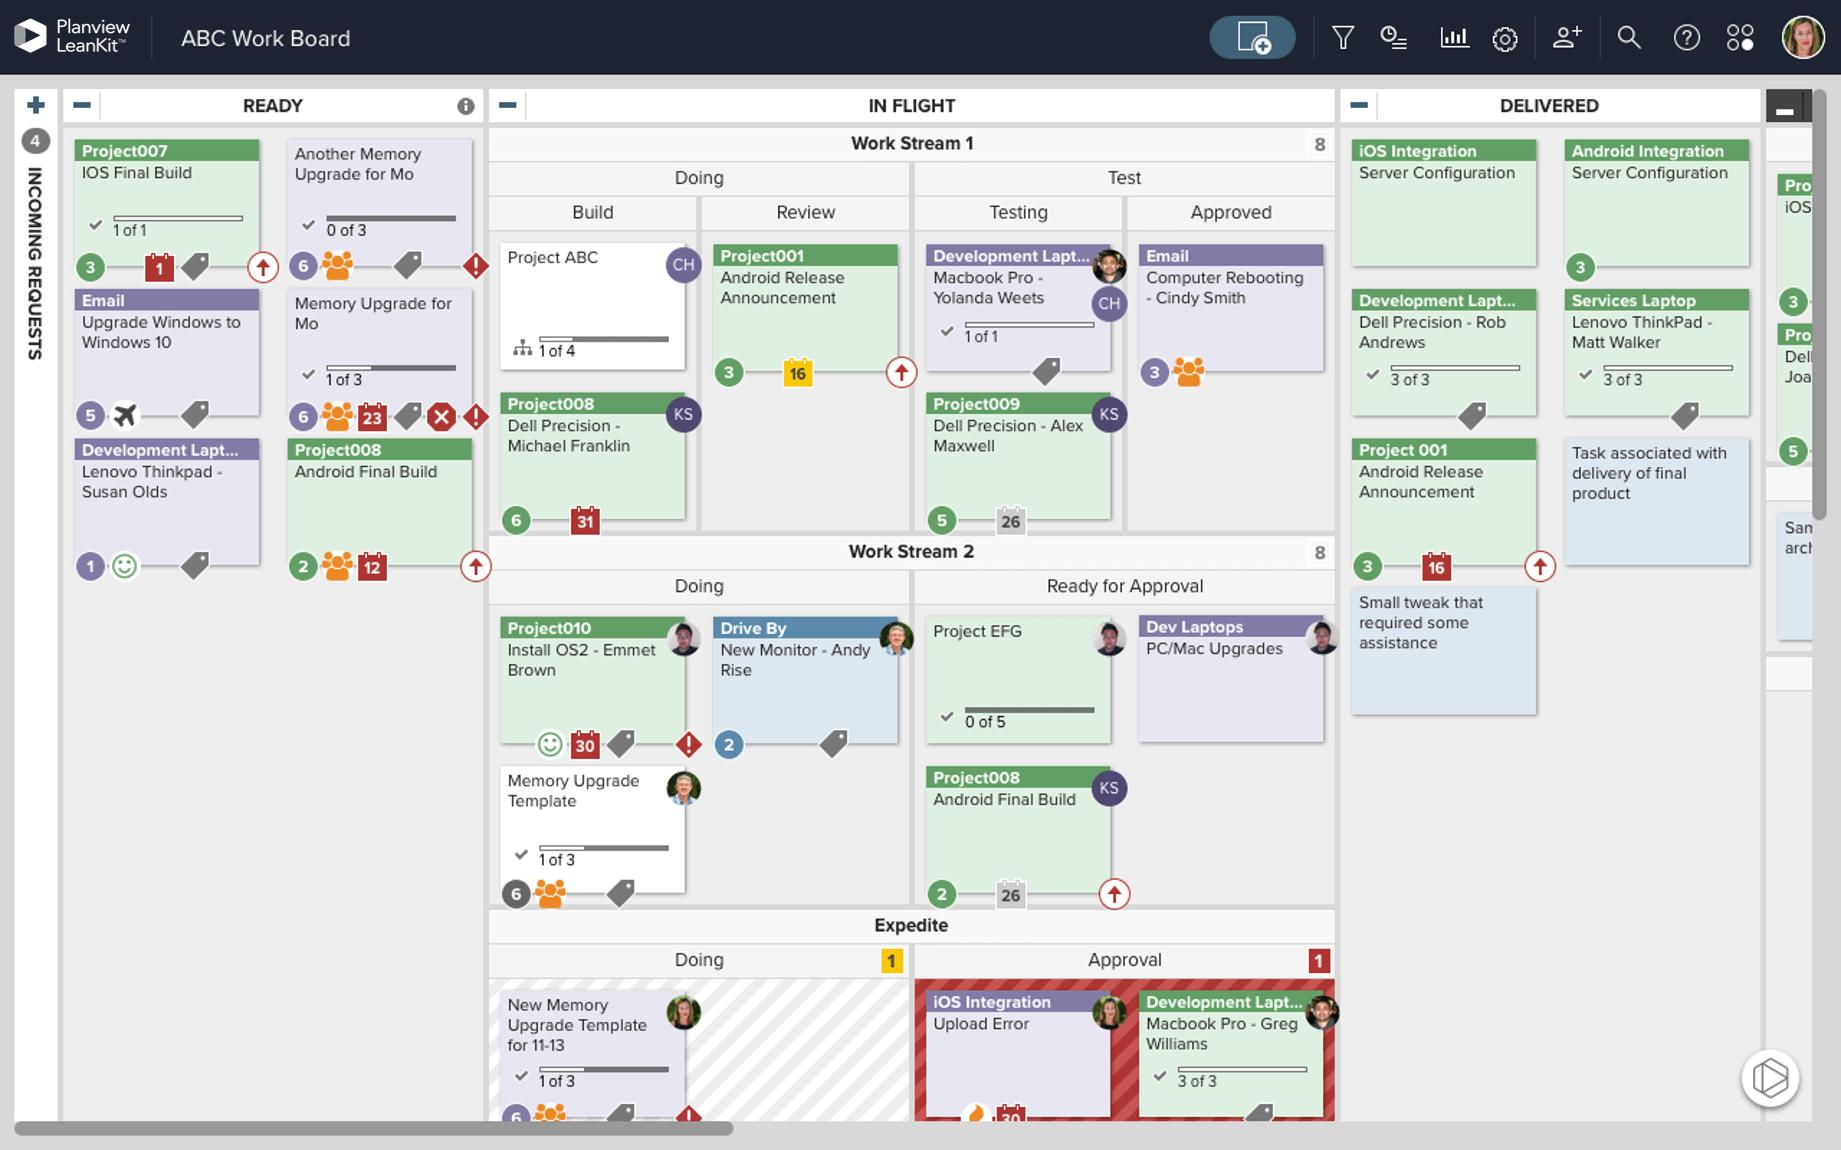 Planview Leankit dashboard